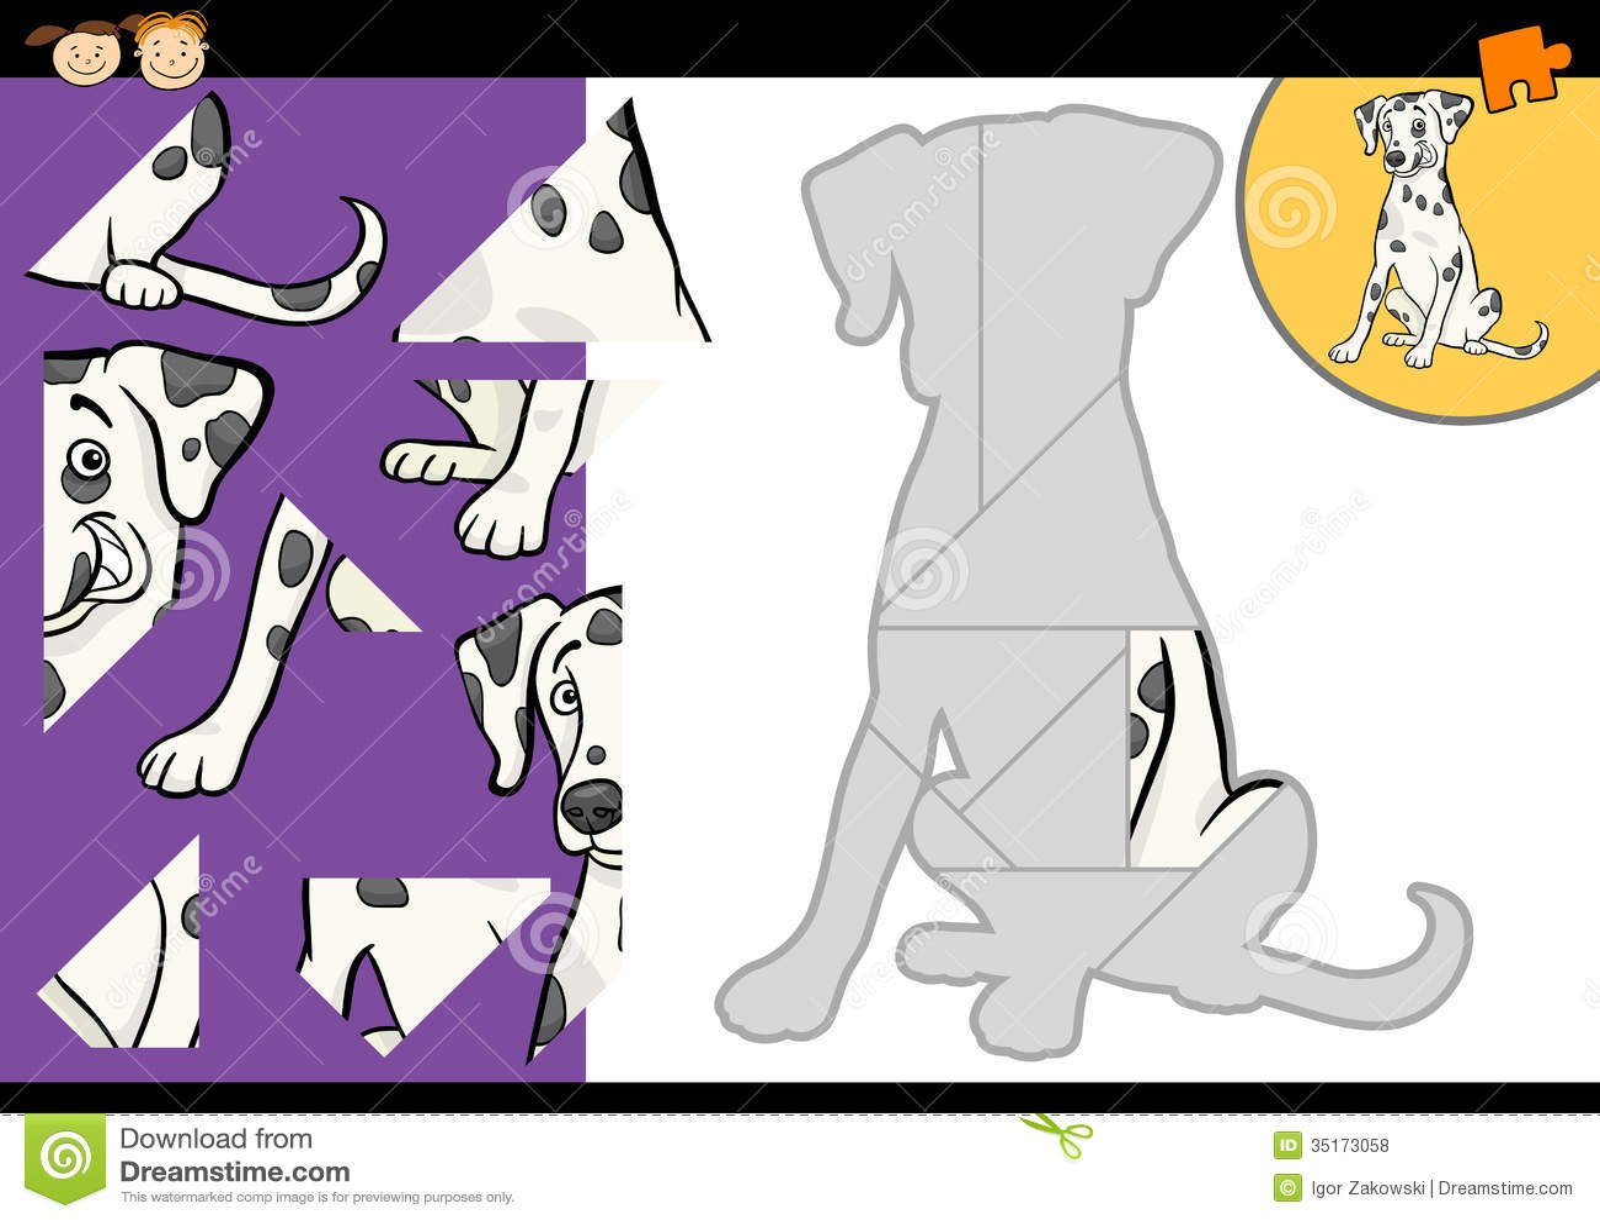 Cartoon Dalmatian Dog Puzzle Game Stock Vector